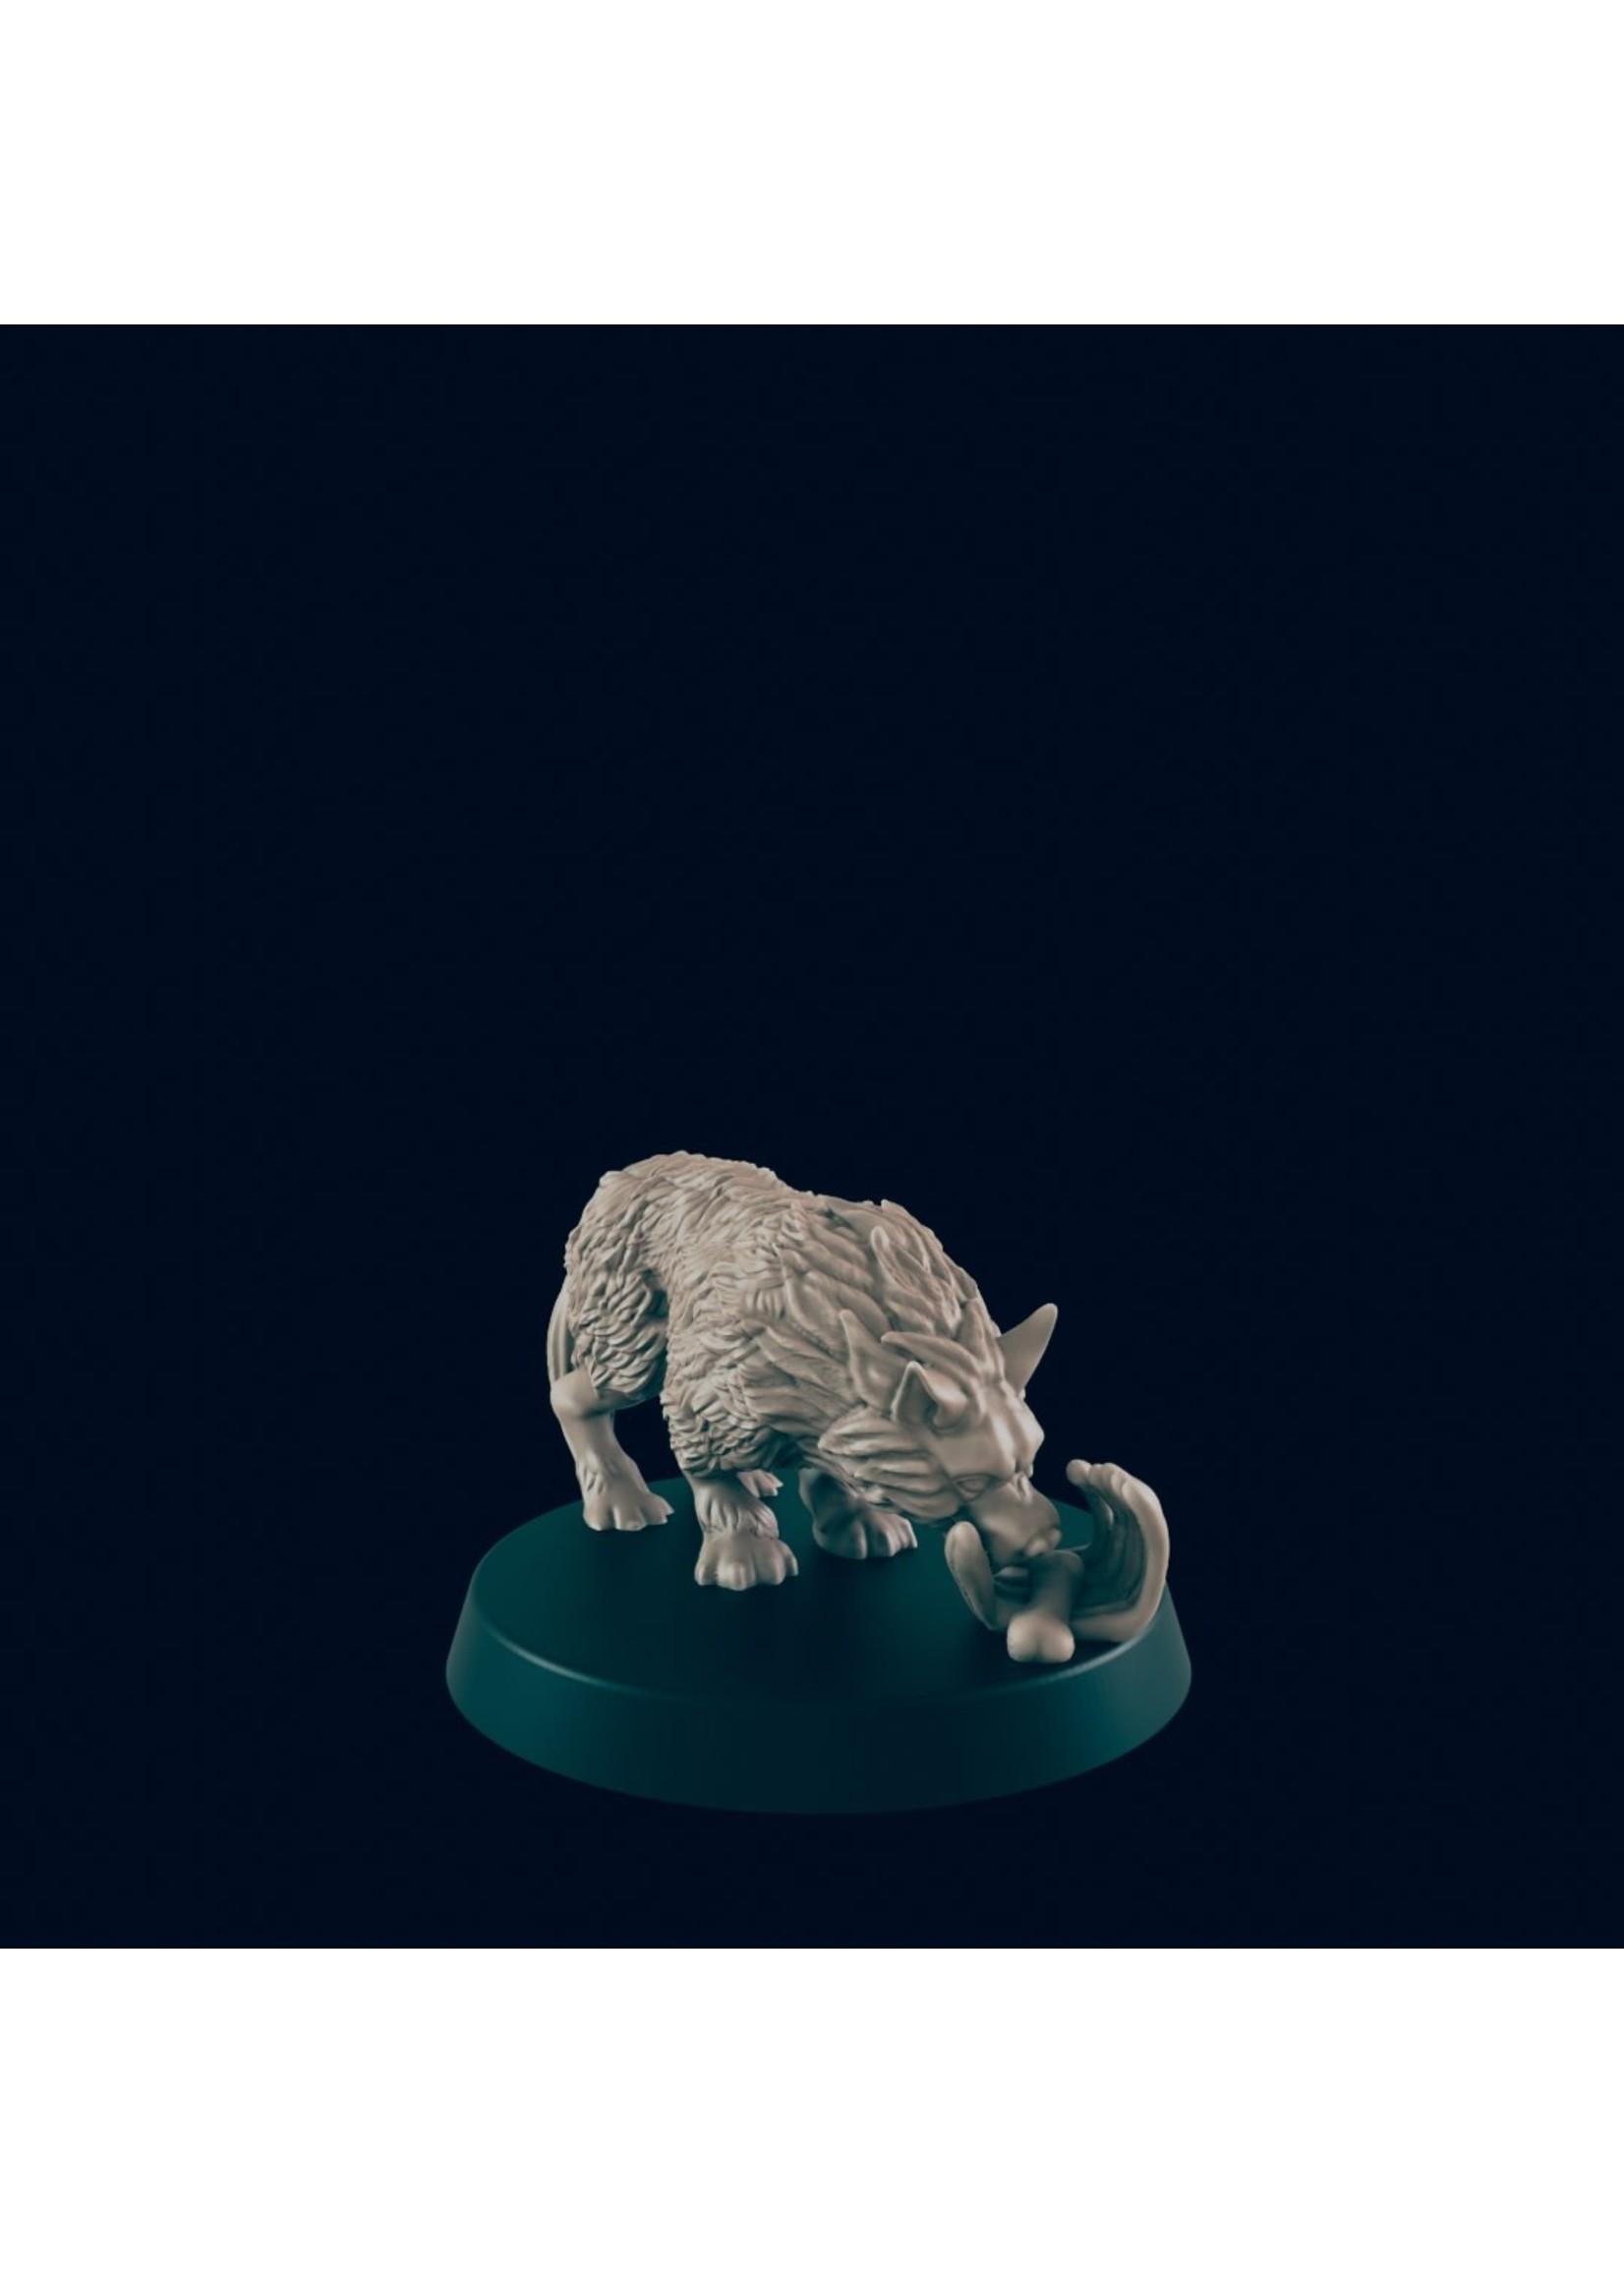 3D Printed Miniature - Wolf 3 - Dungeons & Dragons - Beasts and Baddies KS